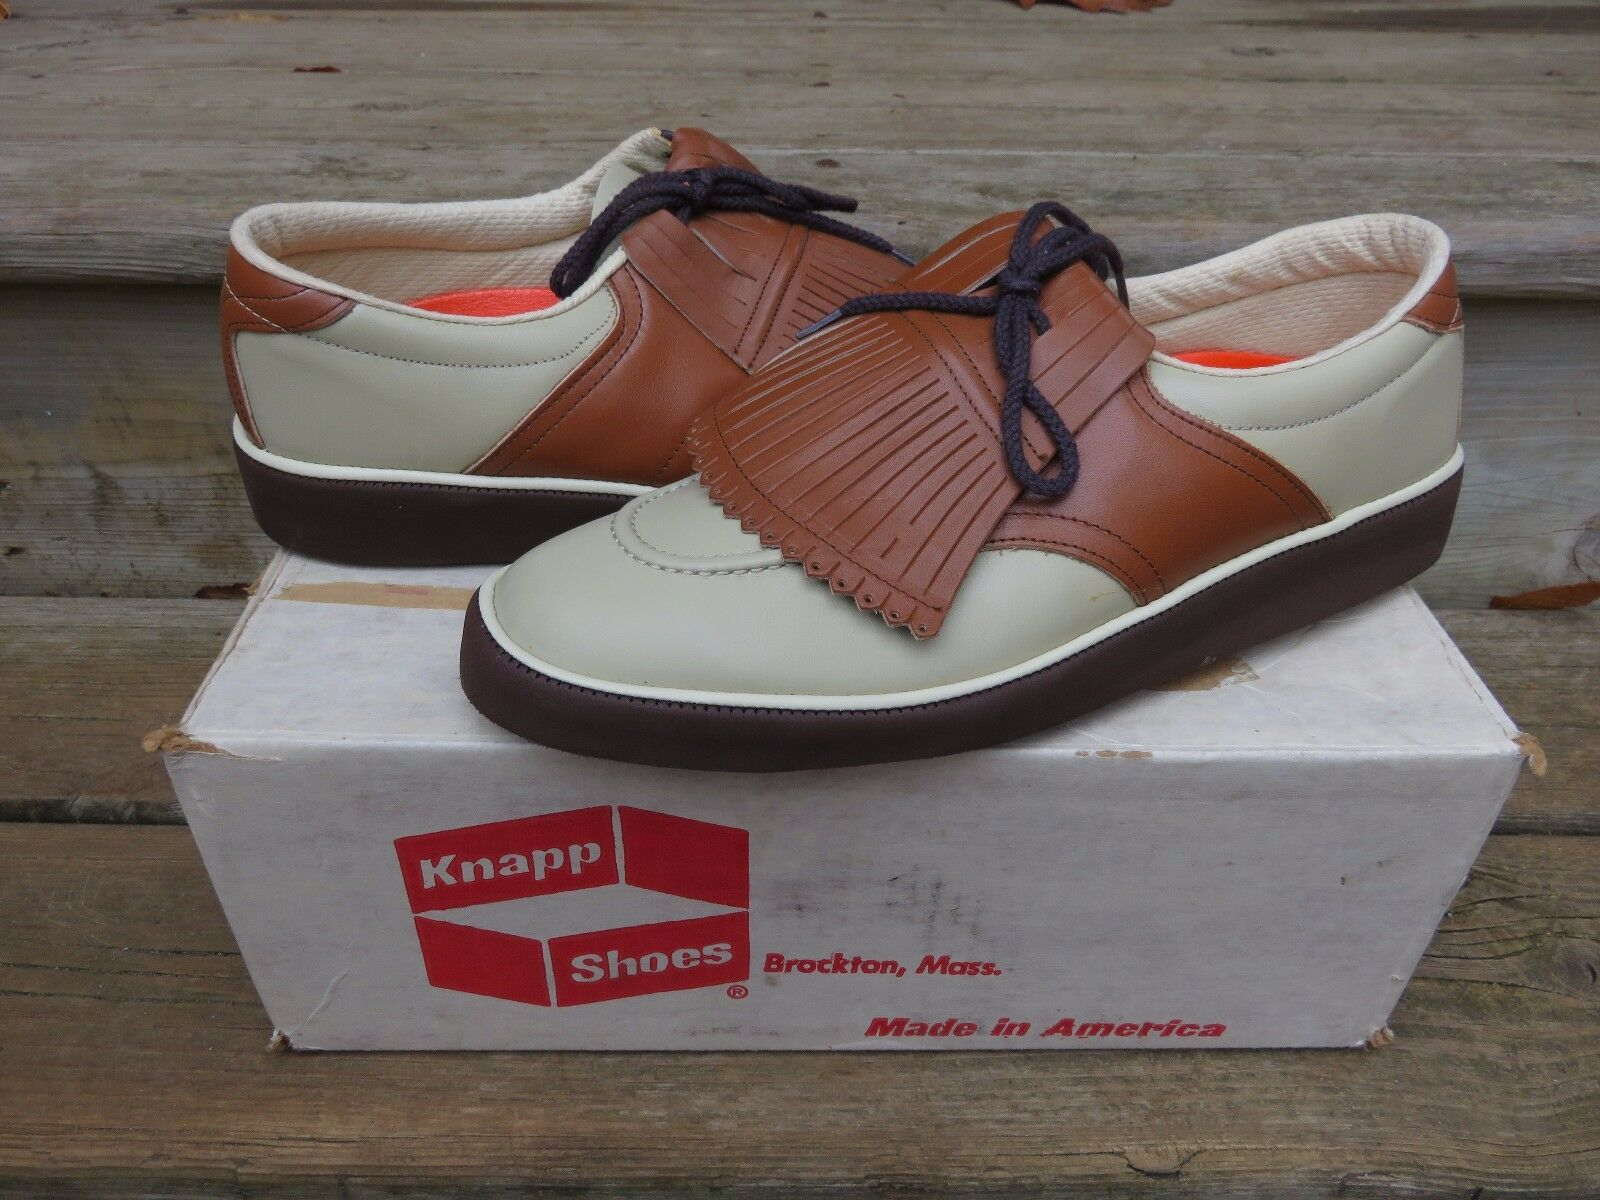 NOS Shoes Knapp Brown/White Casual Golf Shoes NOS VTG Athletic Casual Shoe e979ef